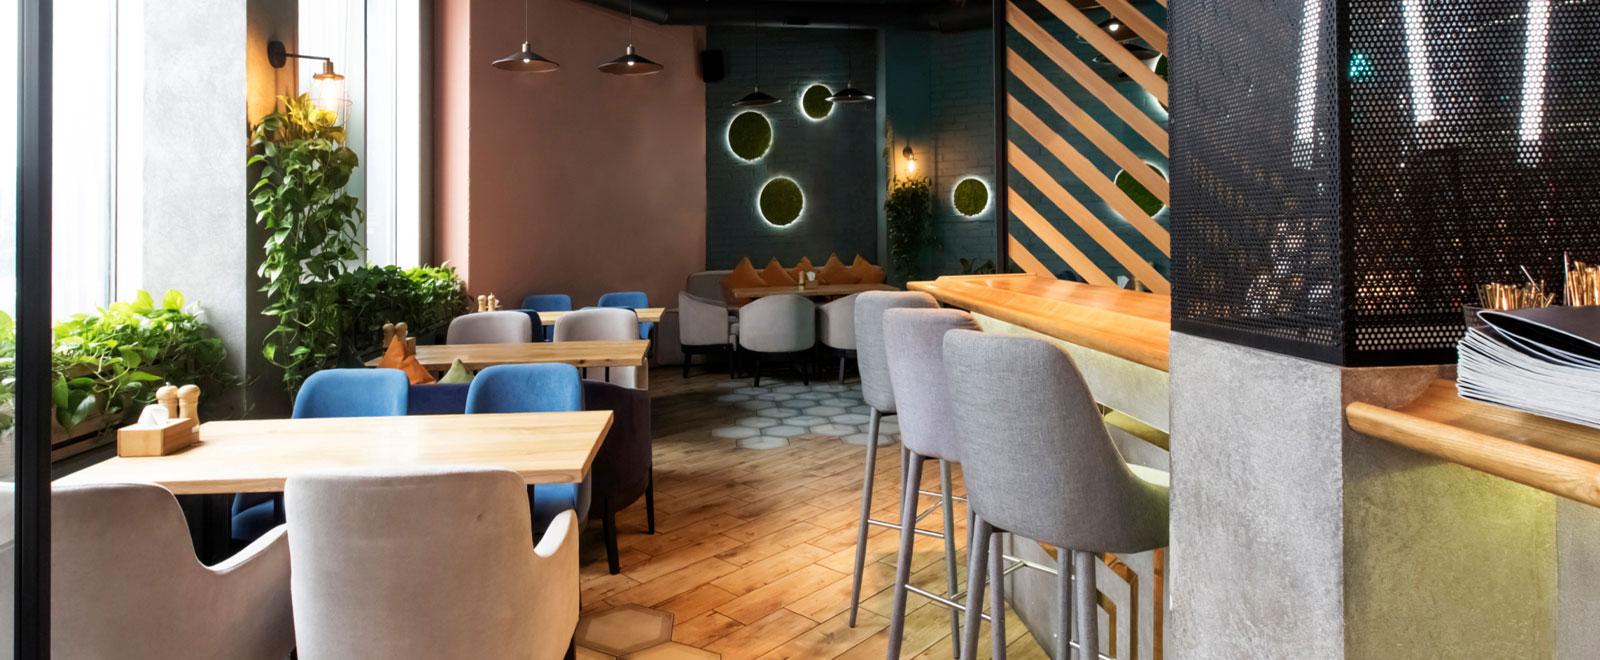 Resource Commercial Advisors - Sectors - Restaurant